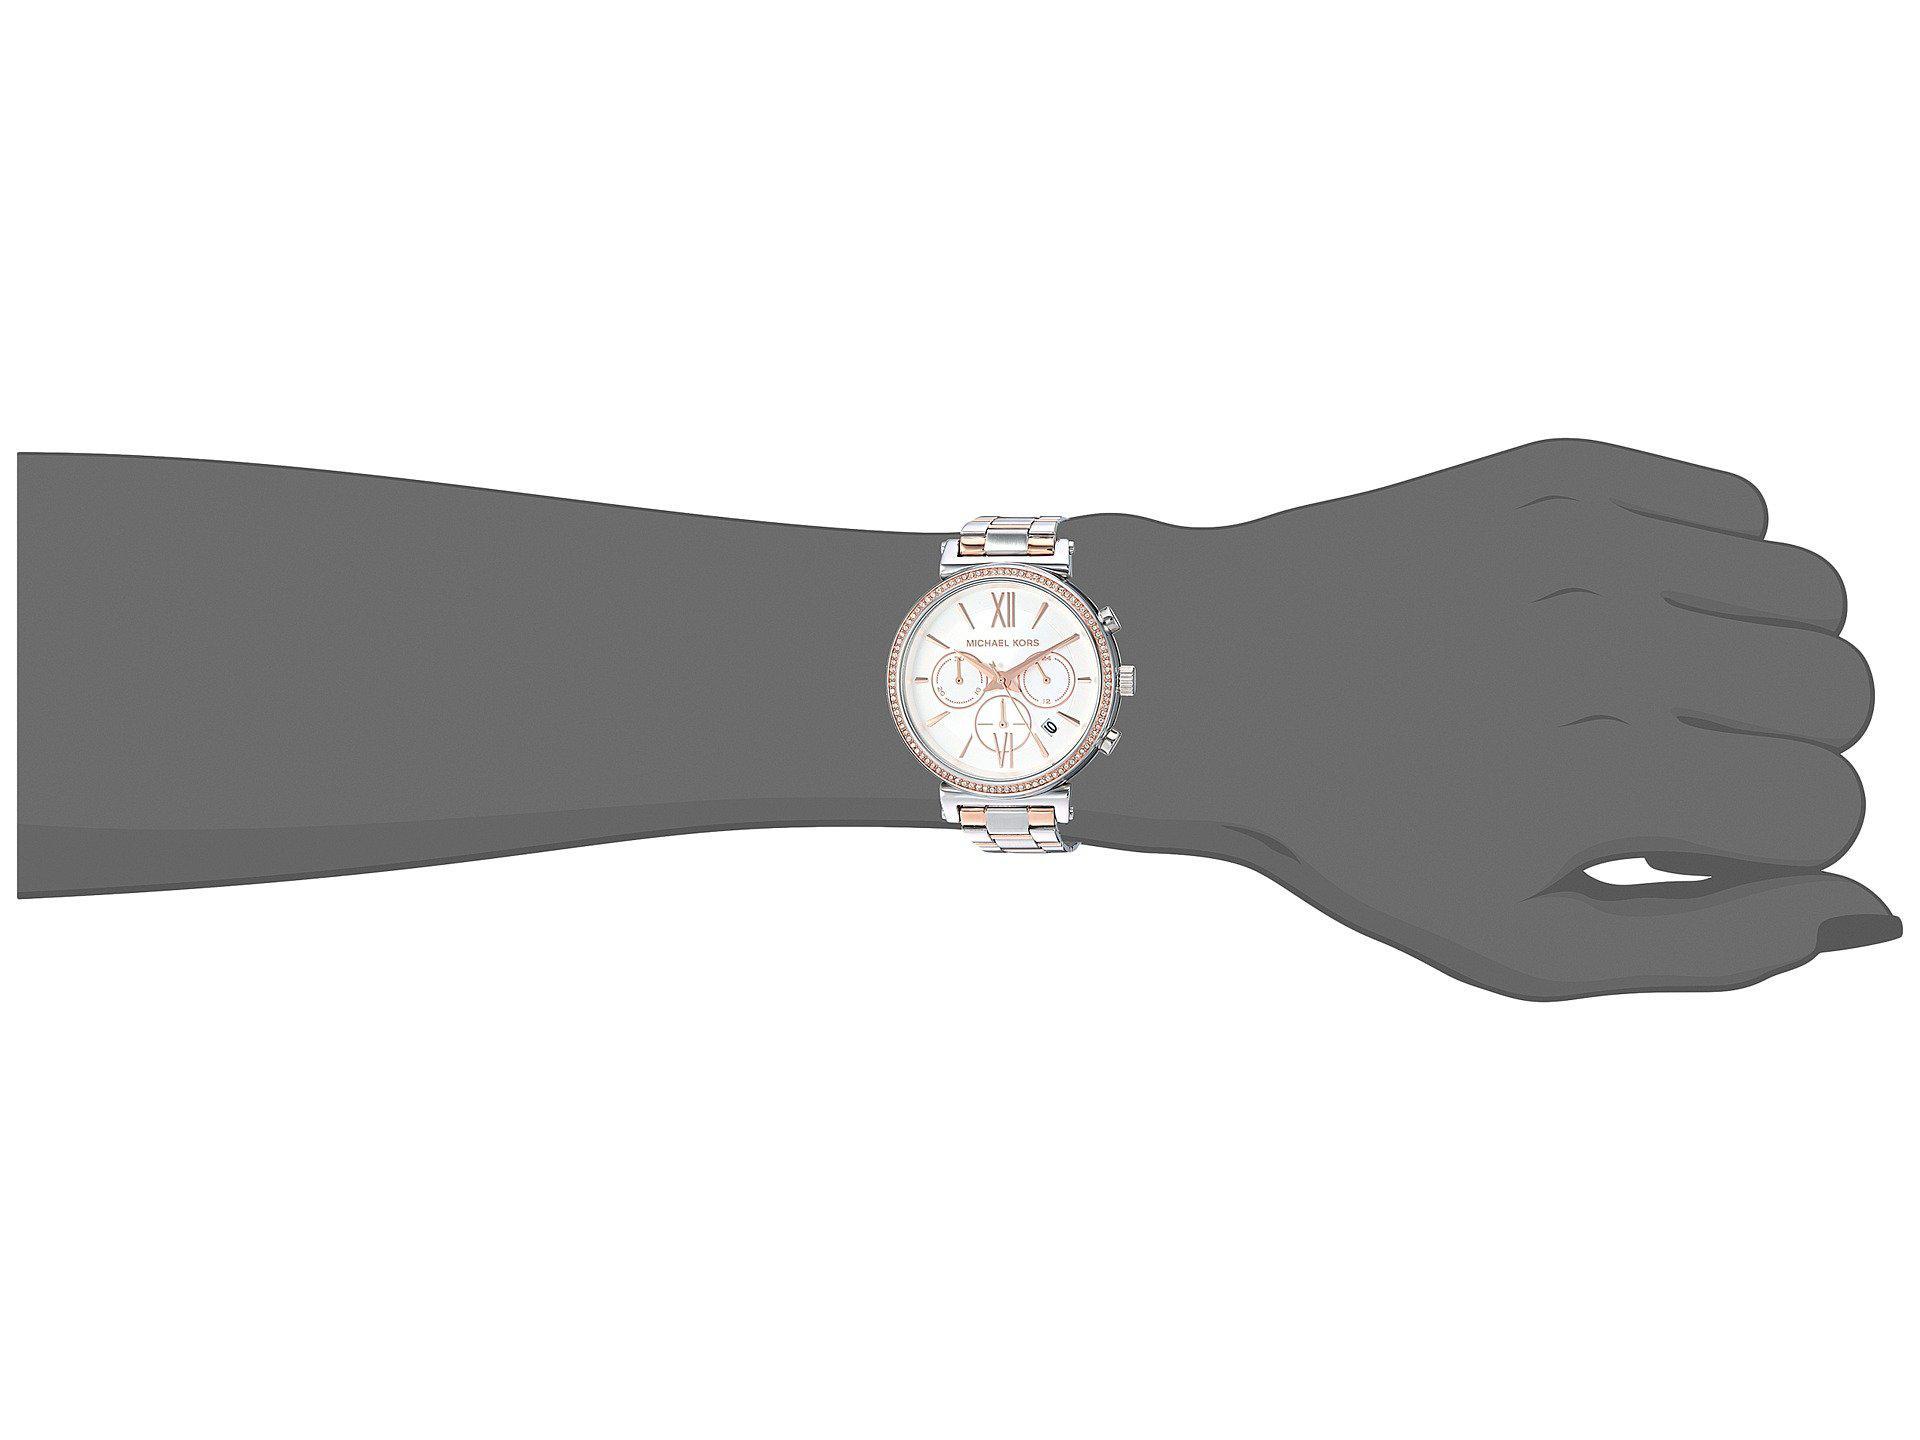 42b1d23d5862 Lyst - Michael Kors Mk6558 - Sofie (two-tone) Watches